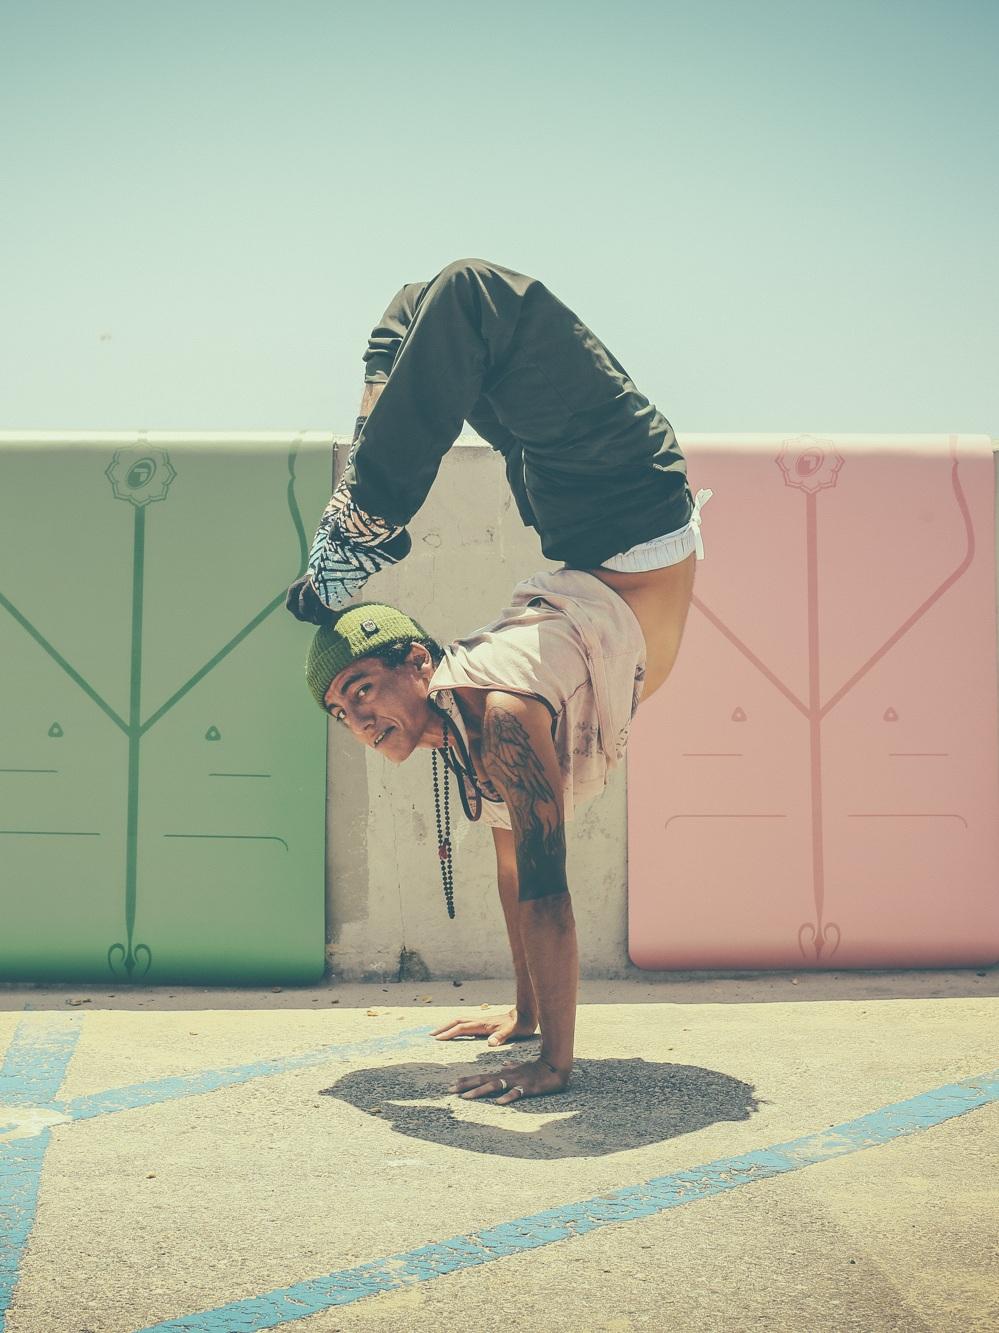 Yancy Scot Schwartz Pro- Skater living in Hollywood California